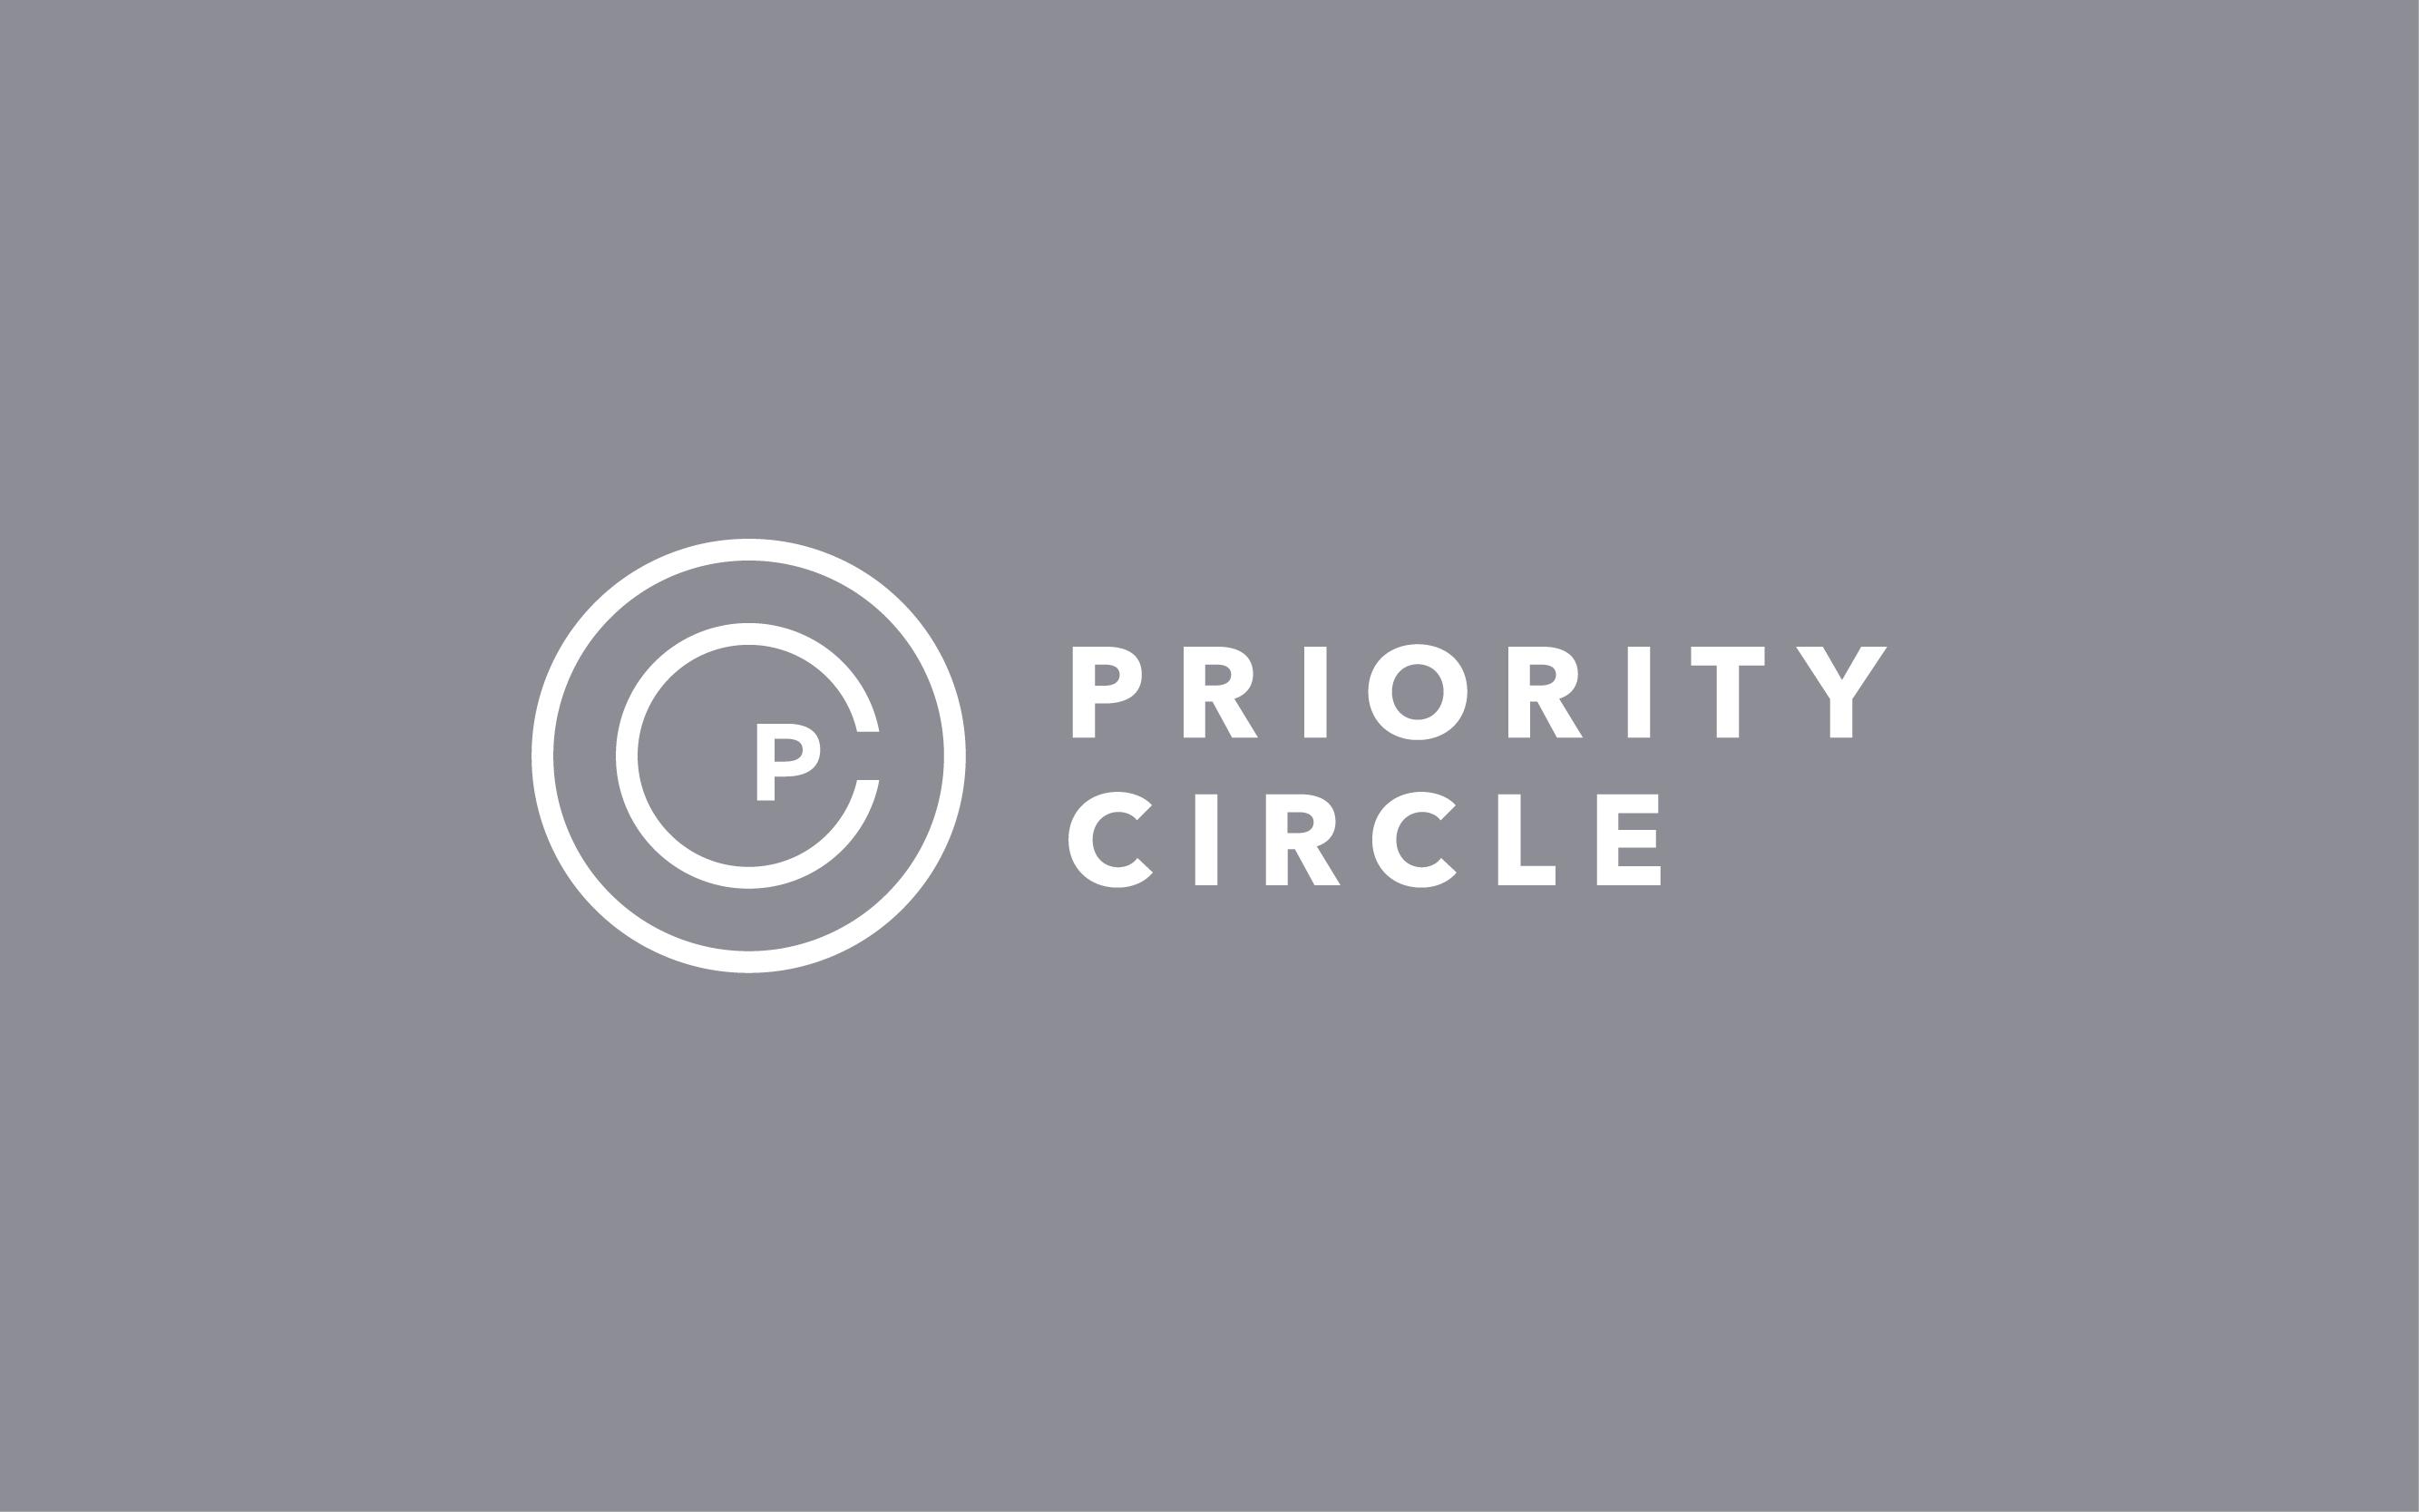 qb_priority_circle-01